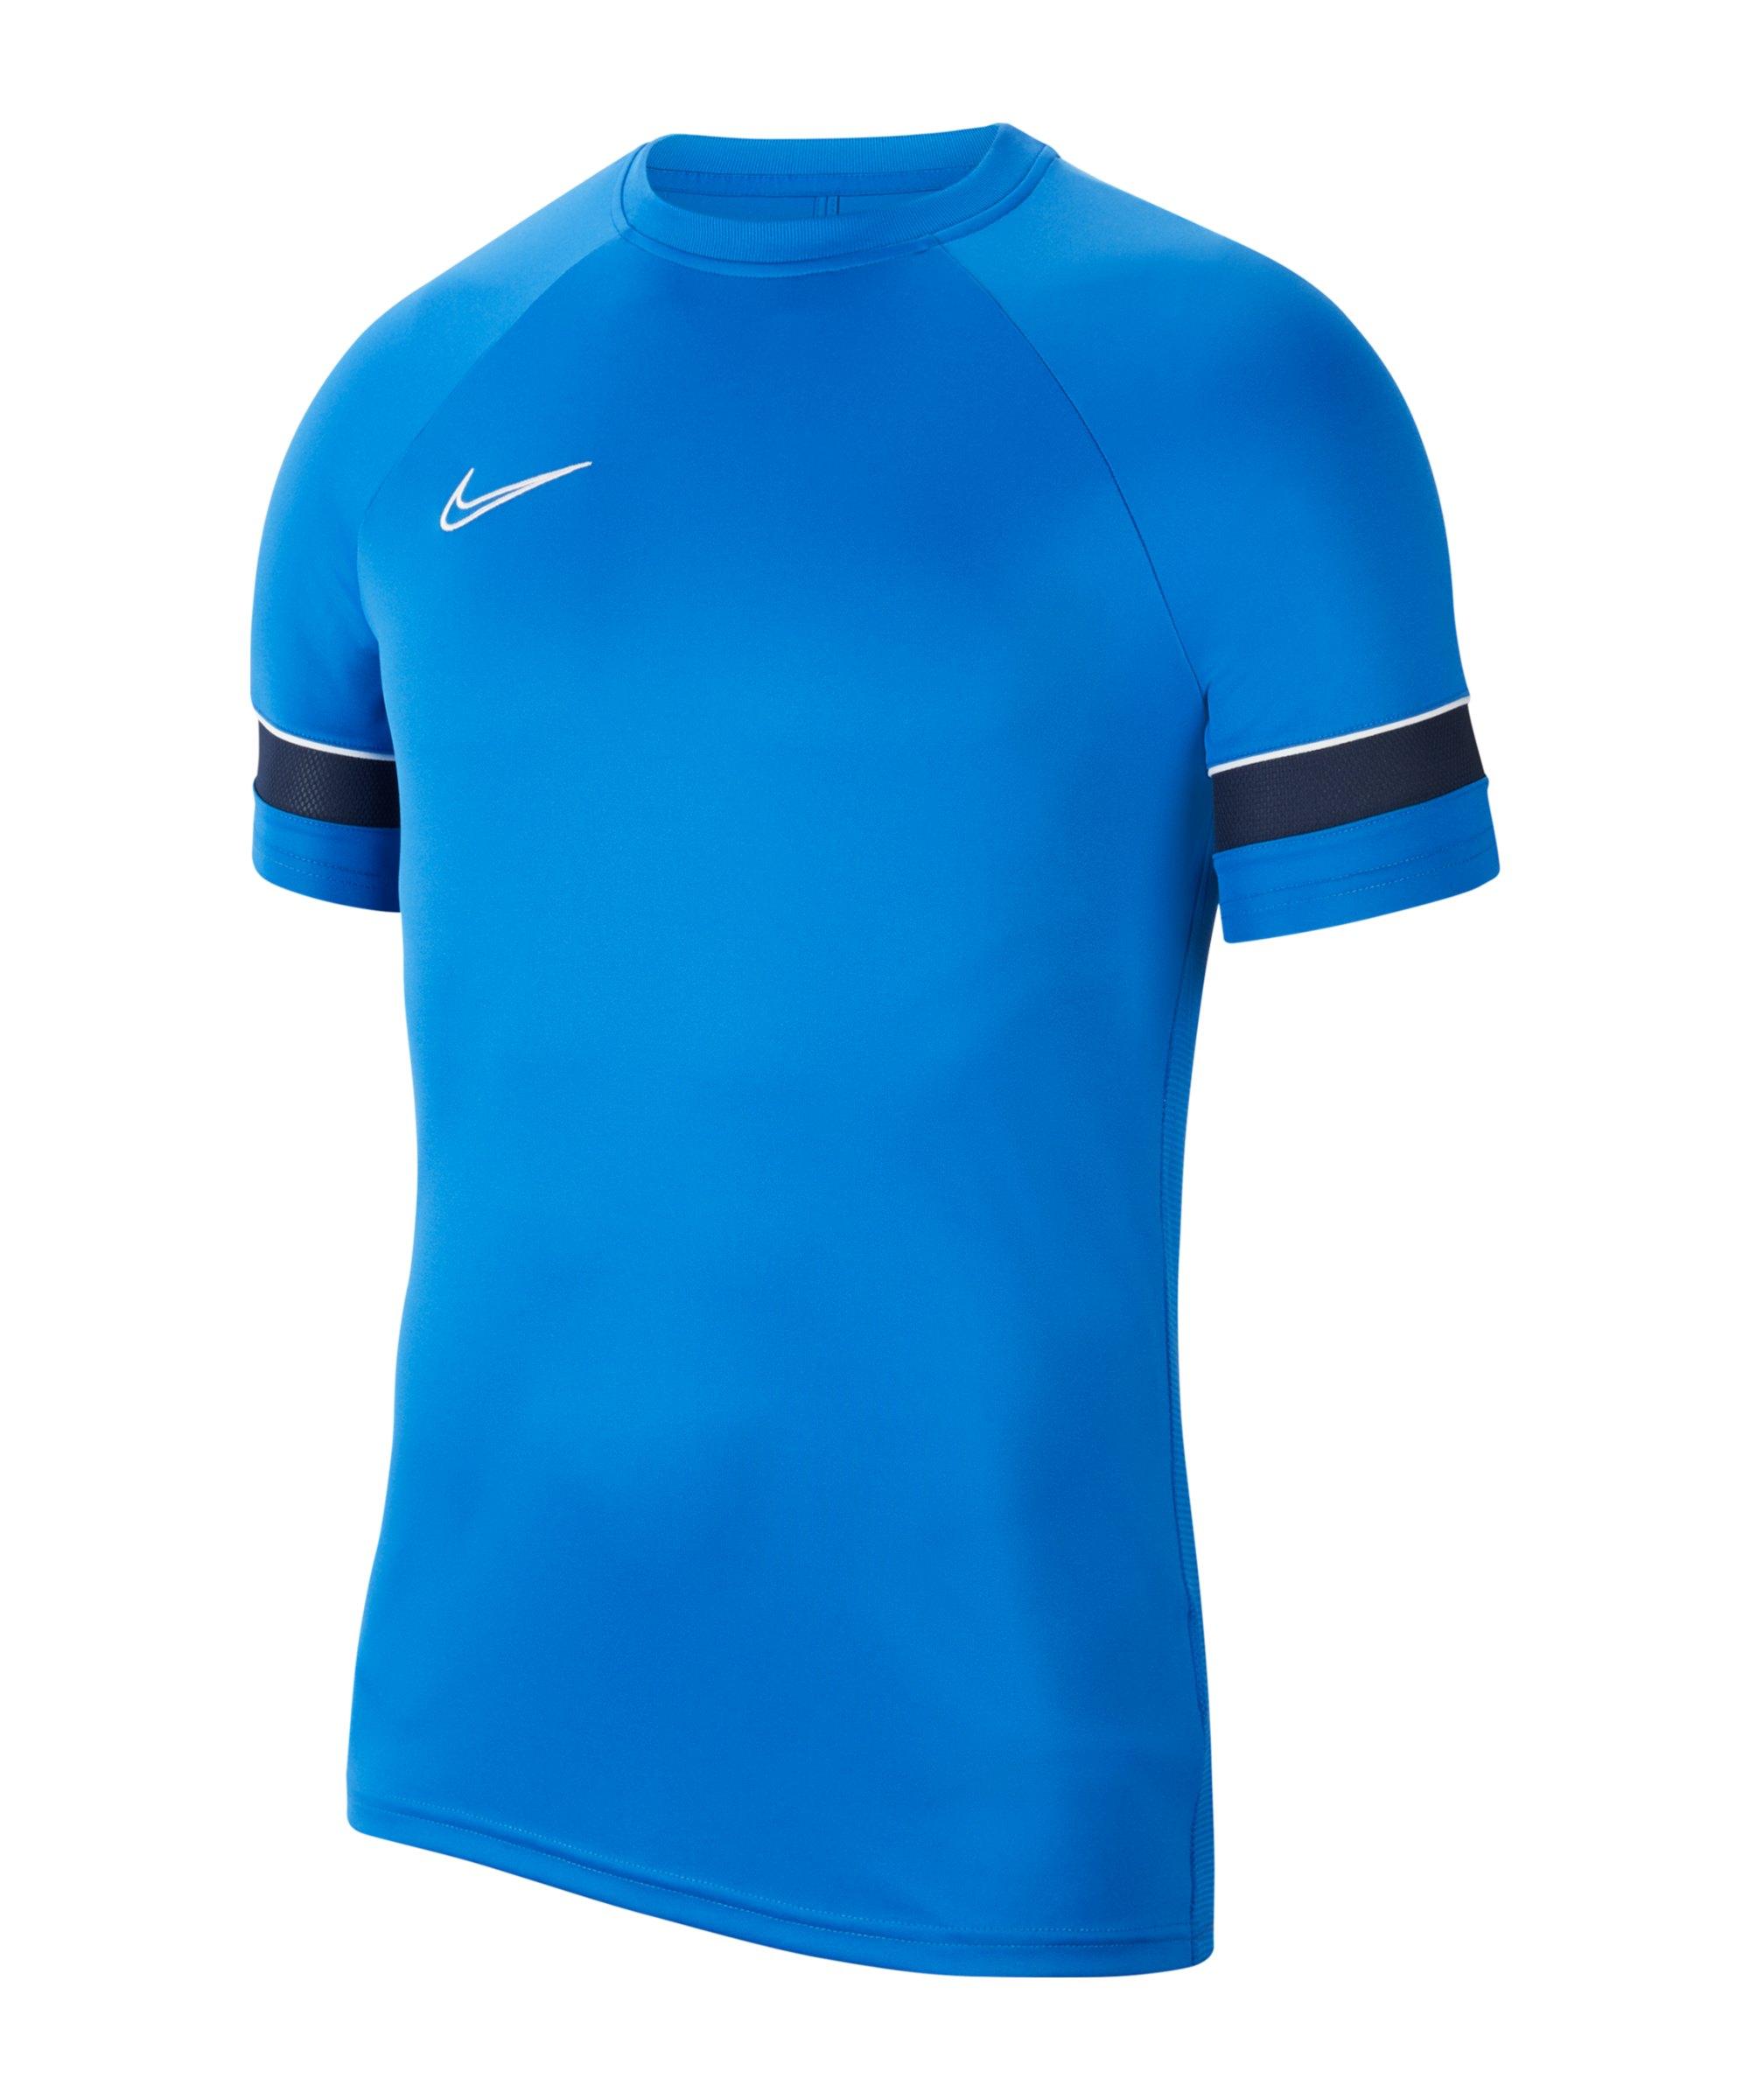 Nike Academy 21 T-Shirt Kids Blau Weiss F463 - blau